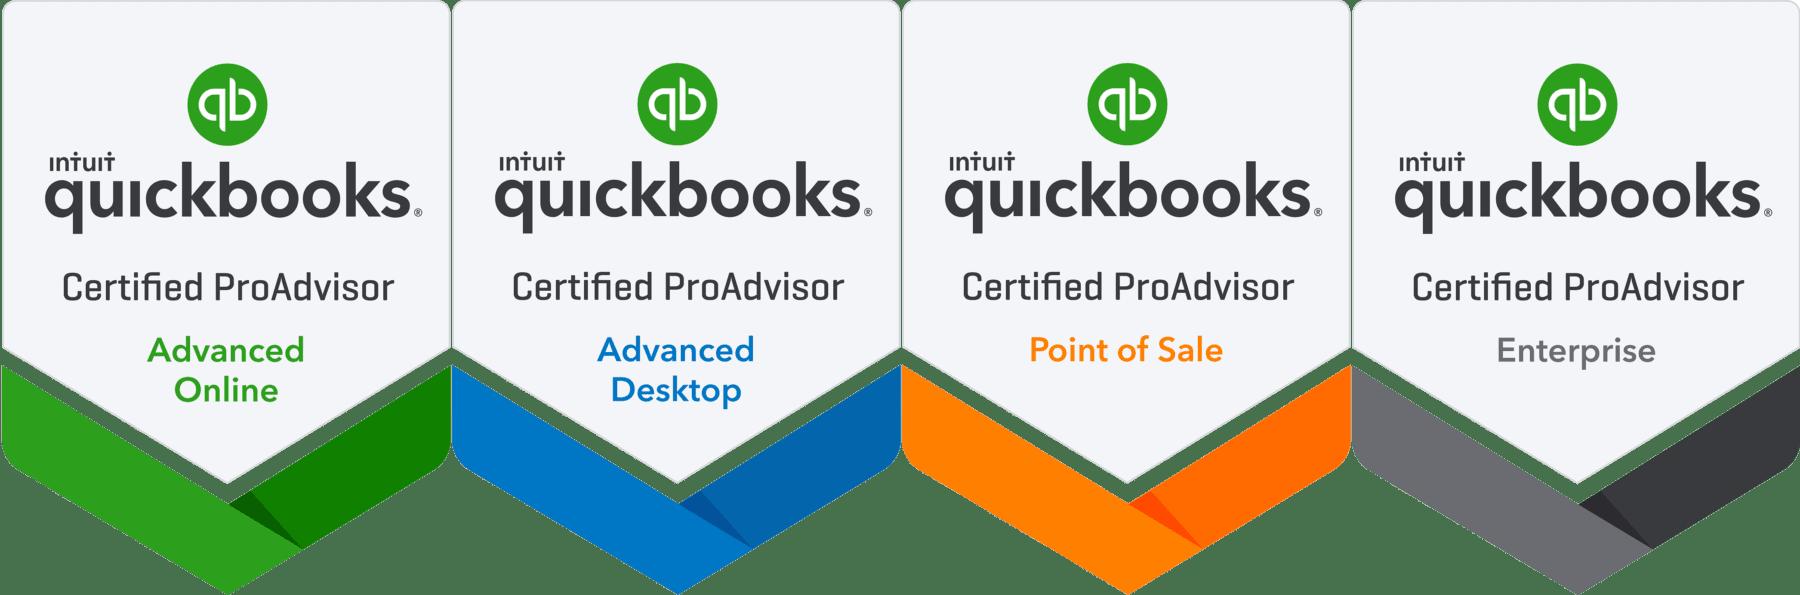 Gita Faust Intuit Advanced Quickbooks Certified Proadvisor